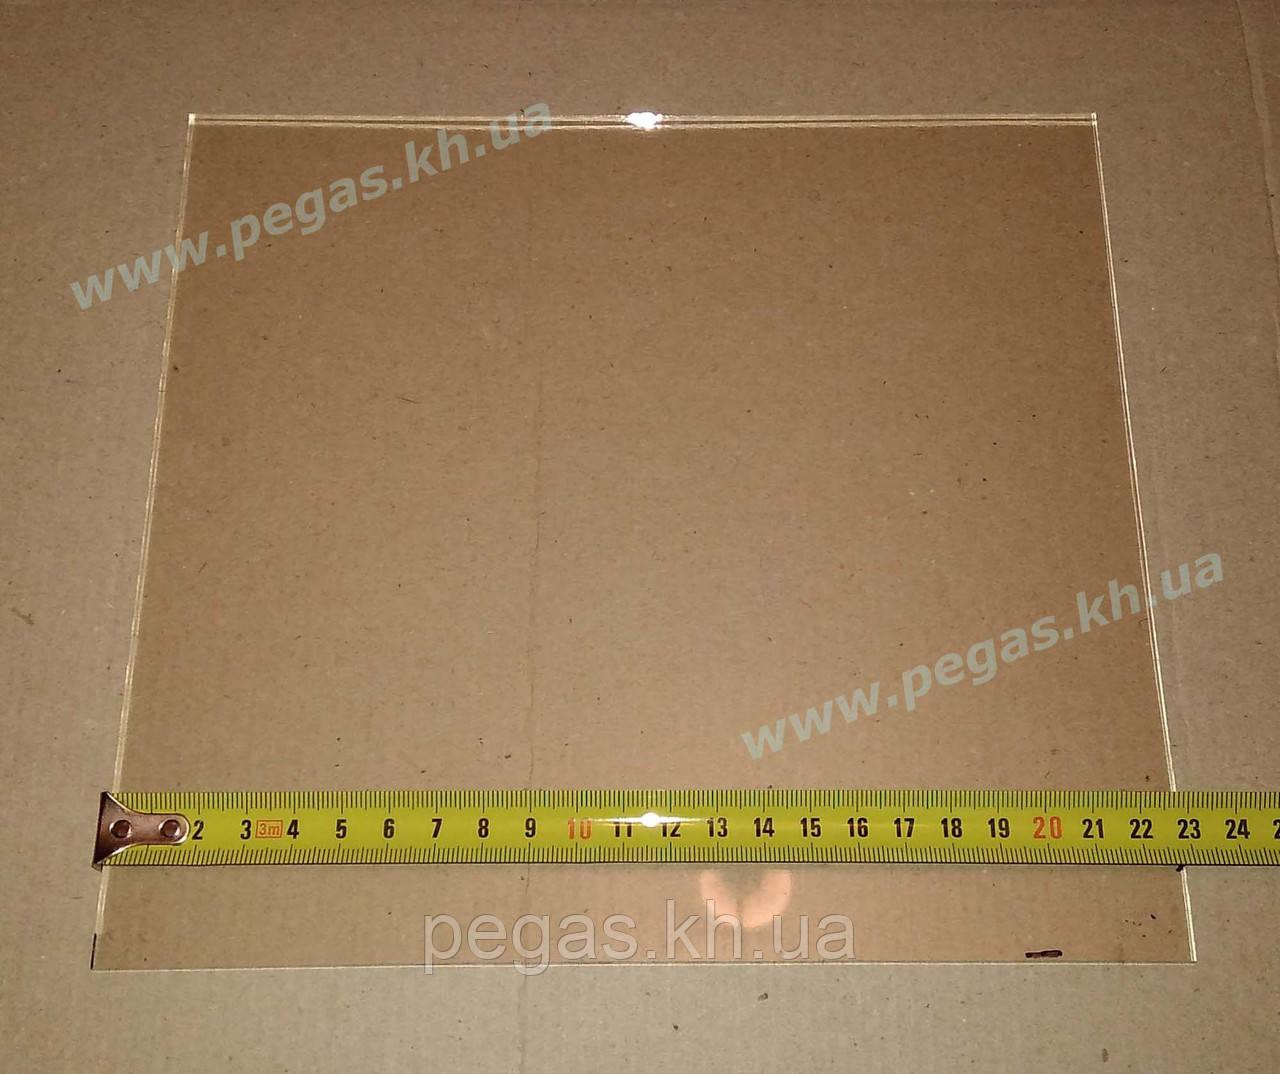 "Огнеупорное жаропрочное стекло ""Robax"", Германия (210х230 мм)"